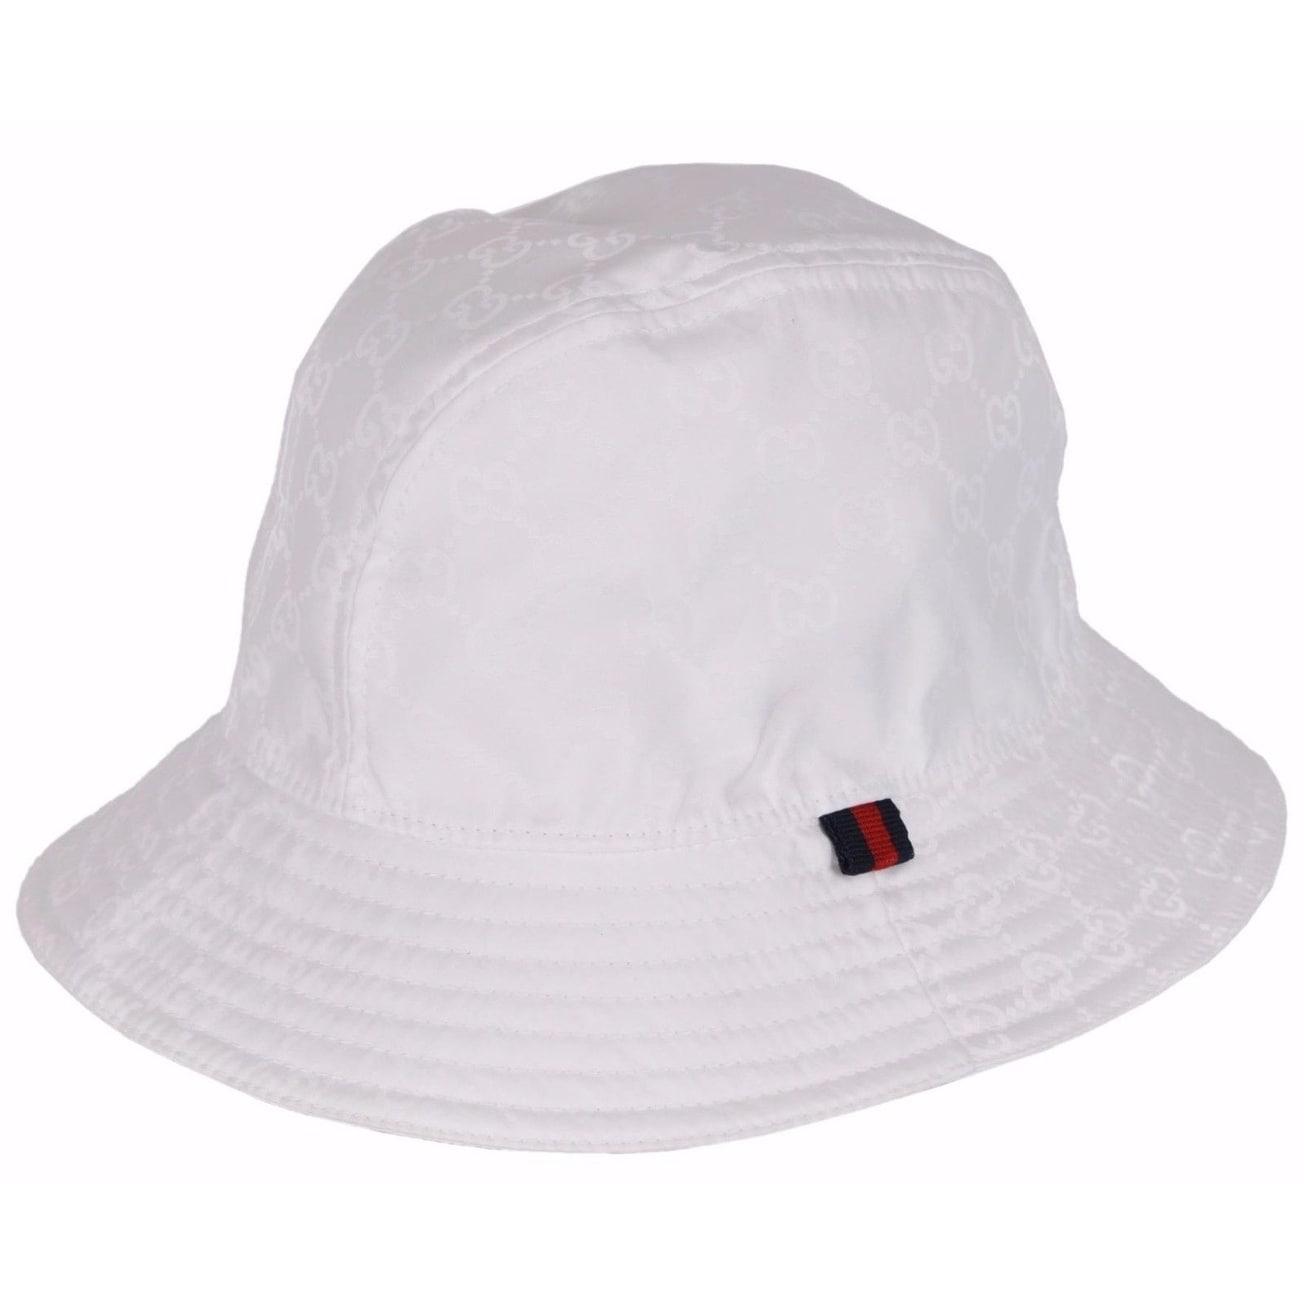 14660a80acd Shop Gucci Men s 387558 WHITE GG Guccissima Nylon Bucket Rain Hat SMALL 57  CM - Free Shipping Today - Overstock - 12237925